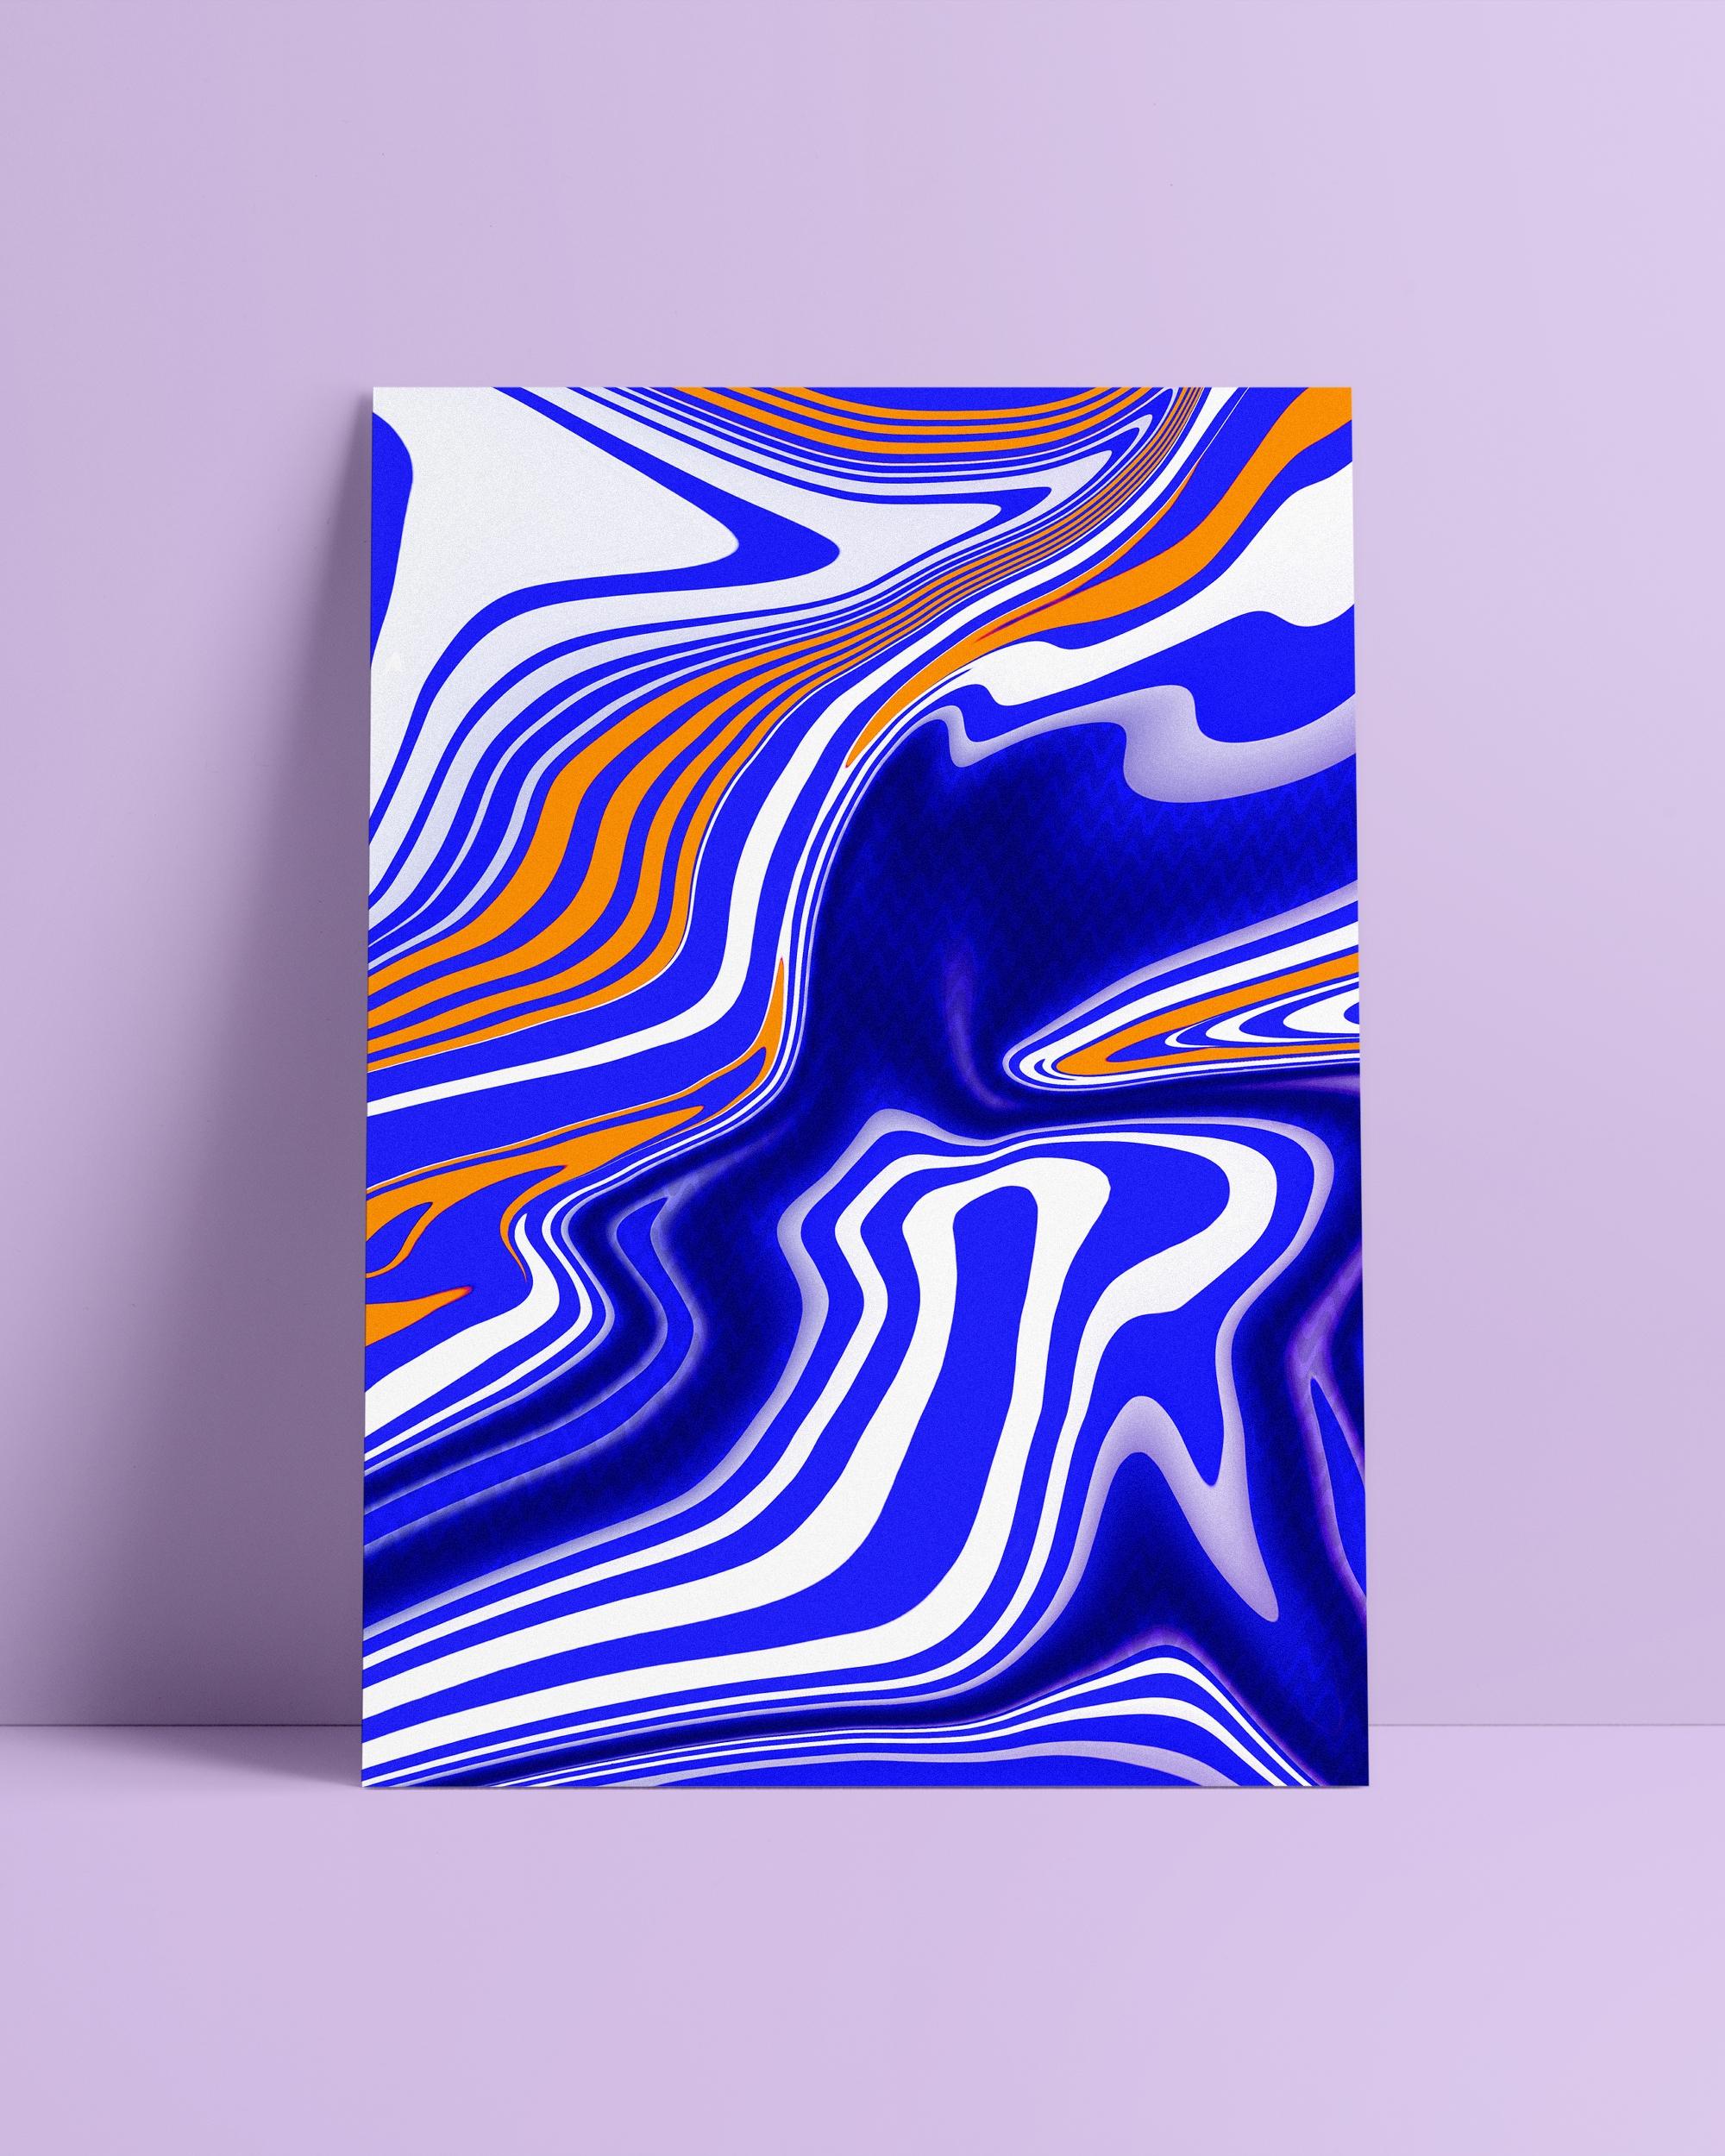 Inspired Damascus steel pattern - wallendiaz | ello